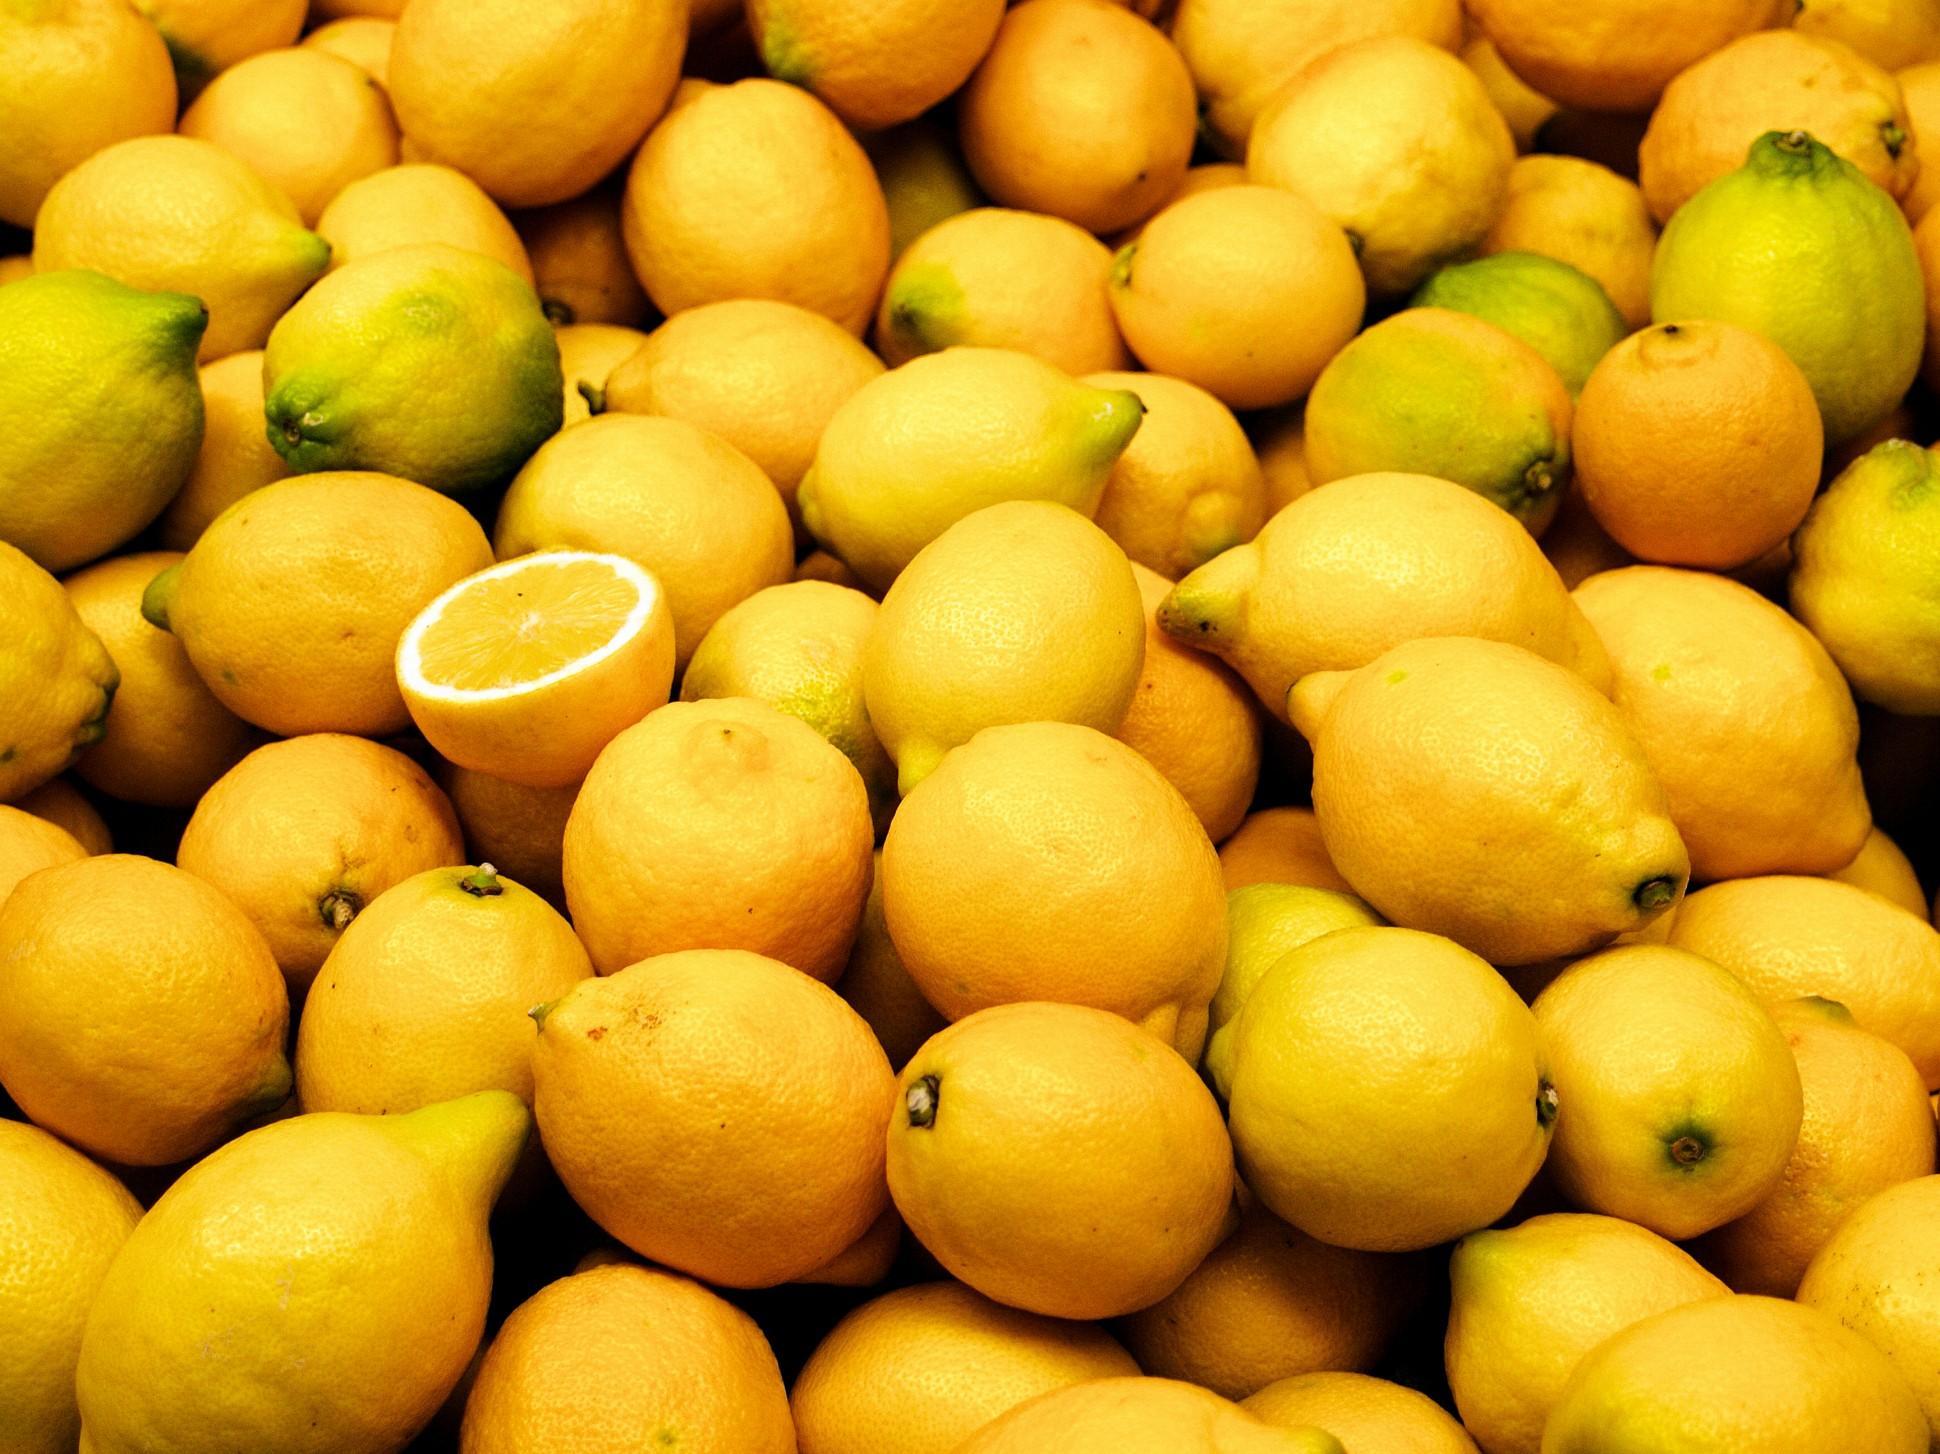 Group lemon pictures